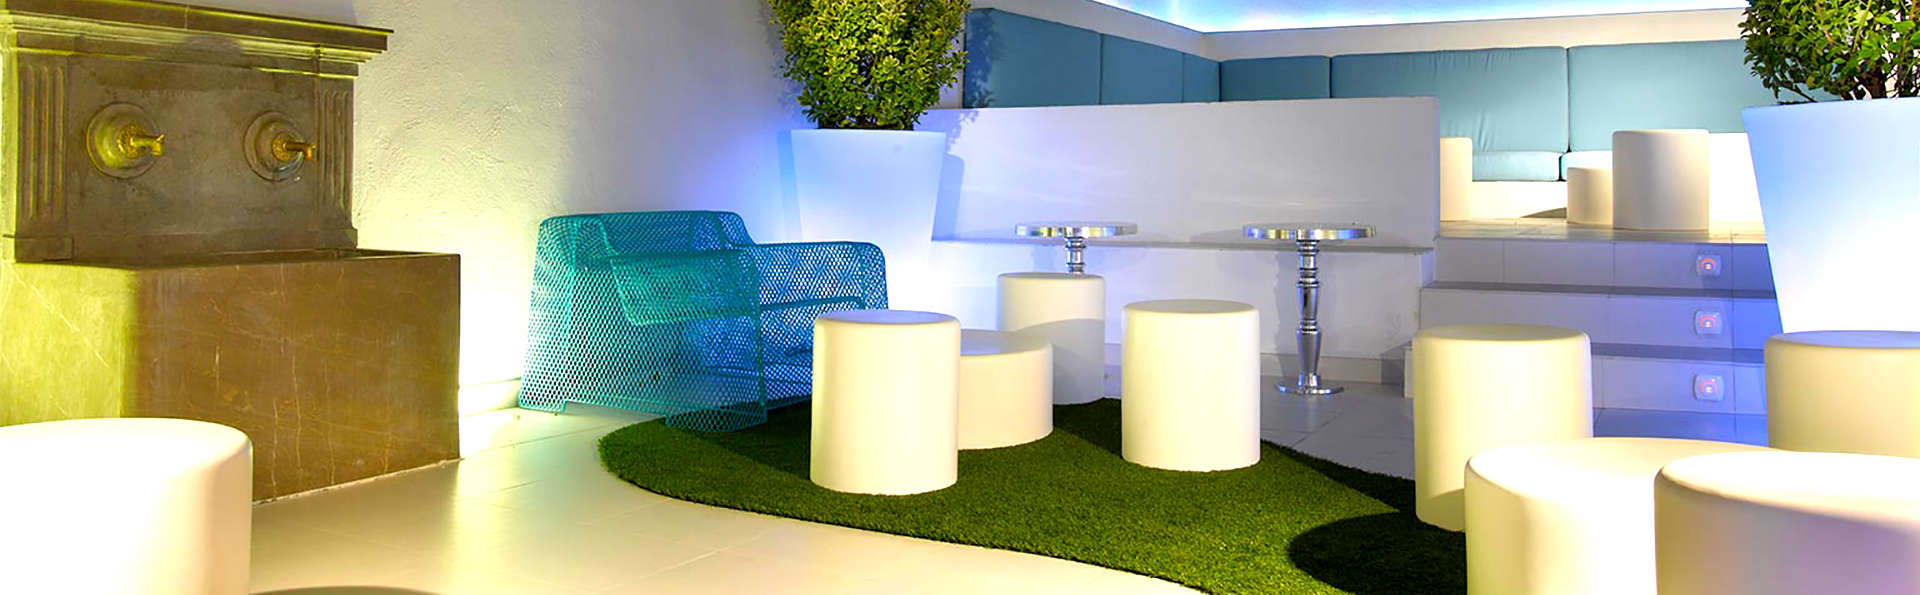 Marquis Hotels Portago - Edit_Lounge.jpg